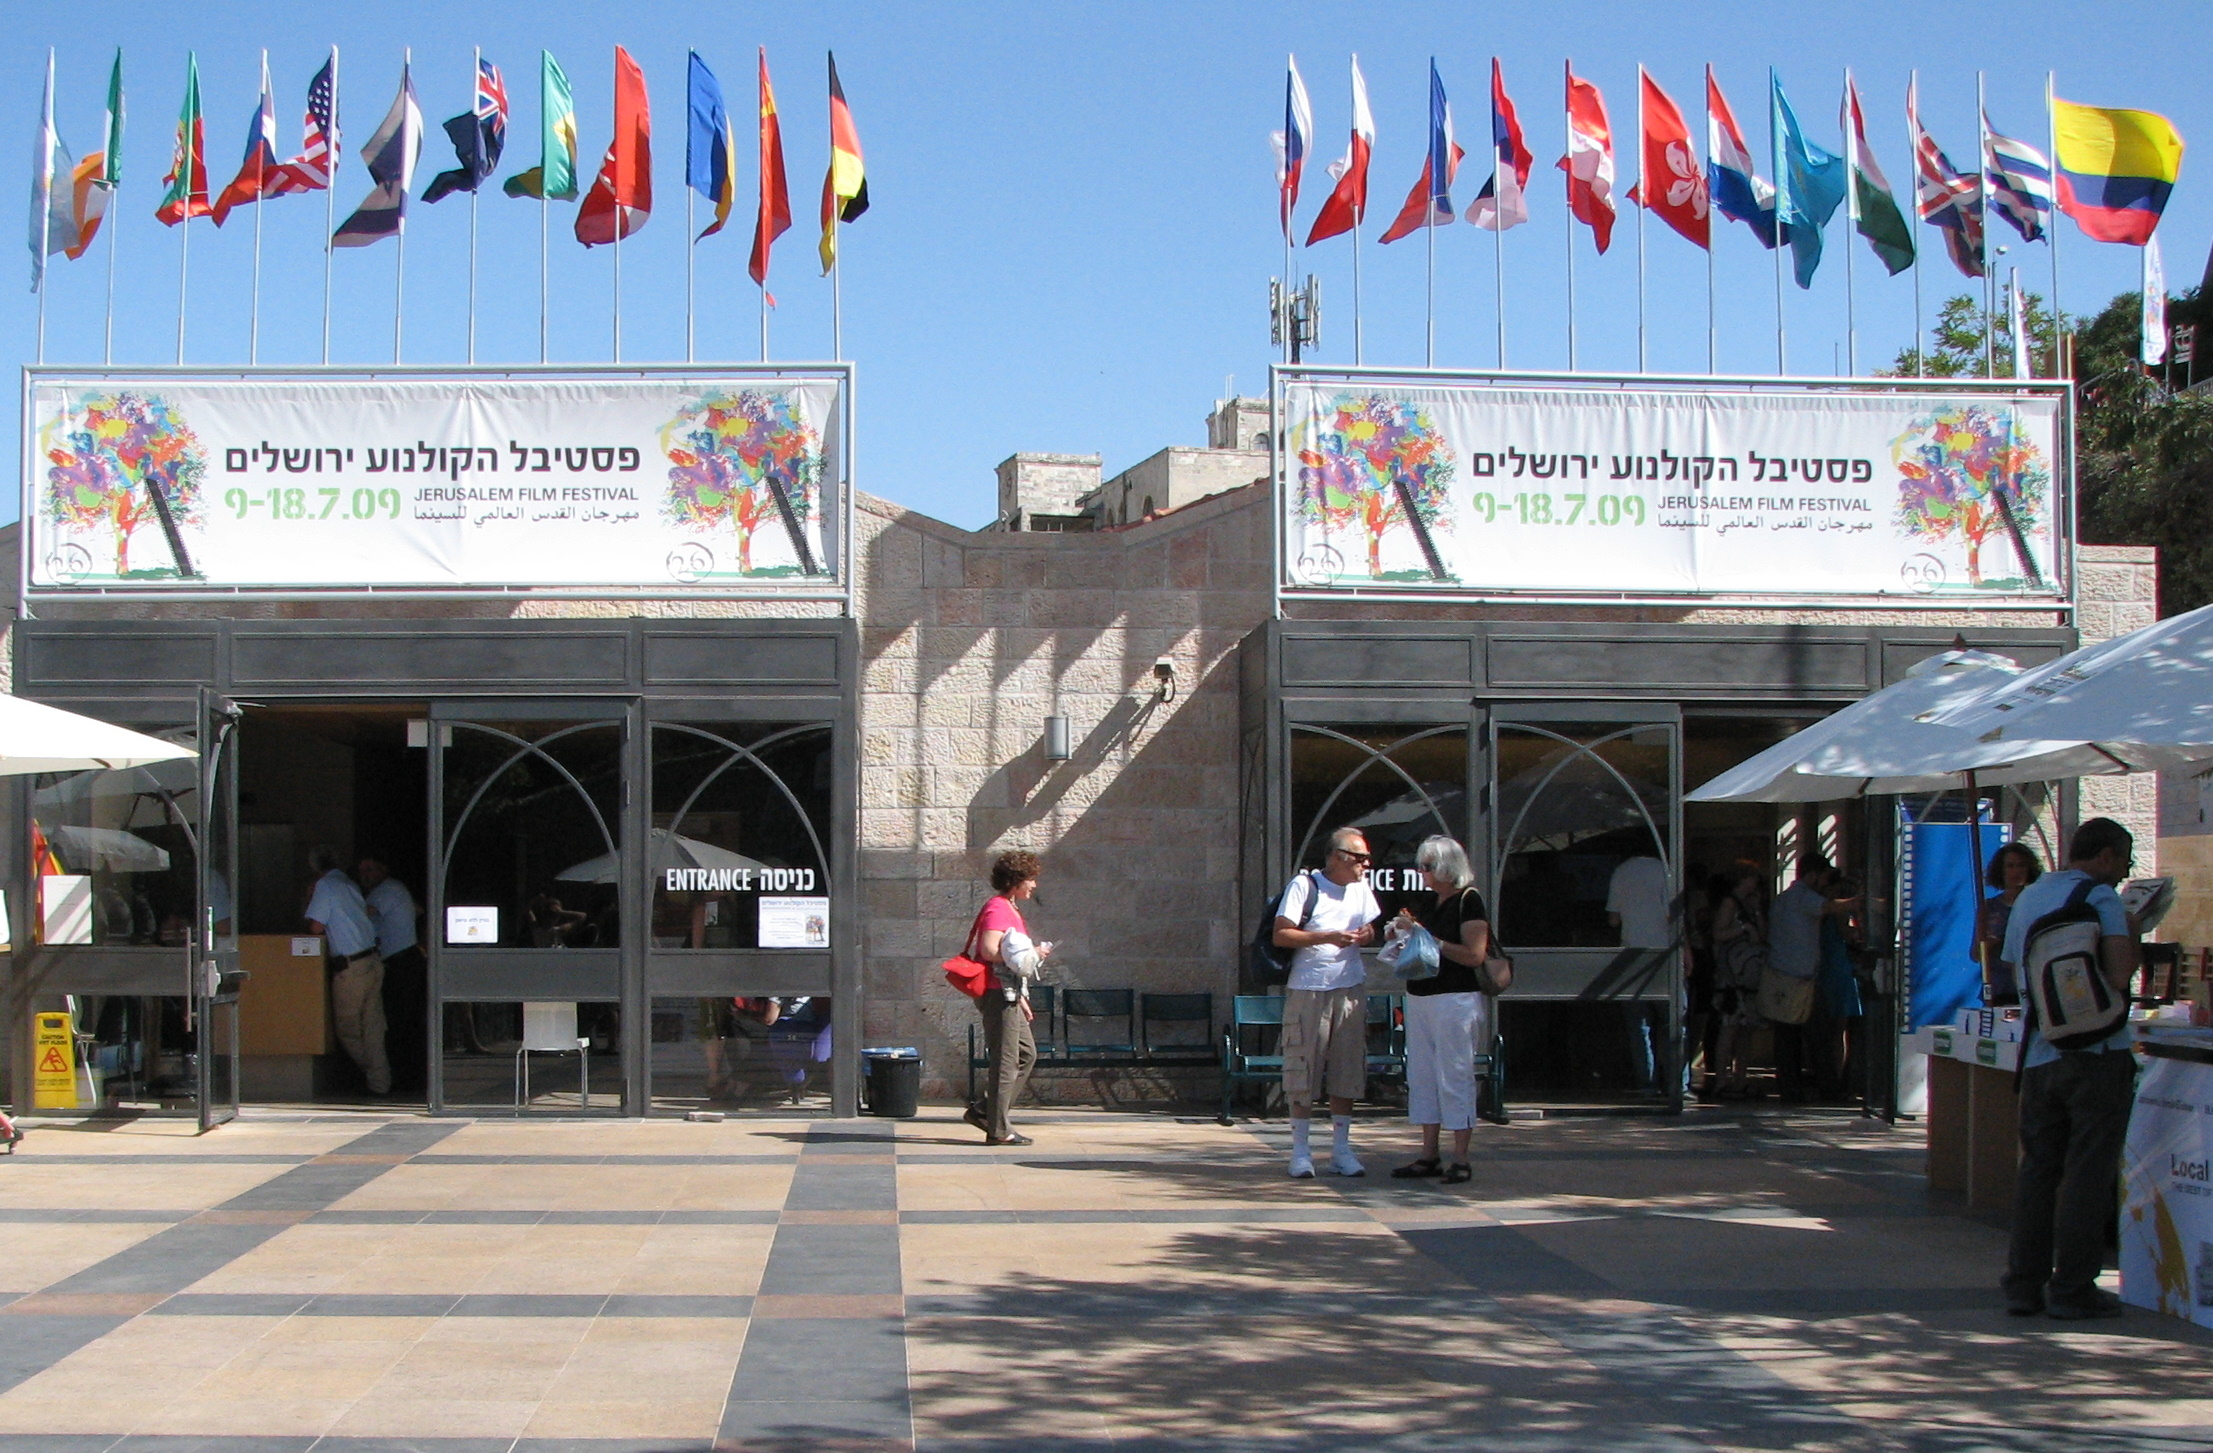 Jerusalem Film Festival - Wikipedia